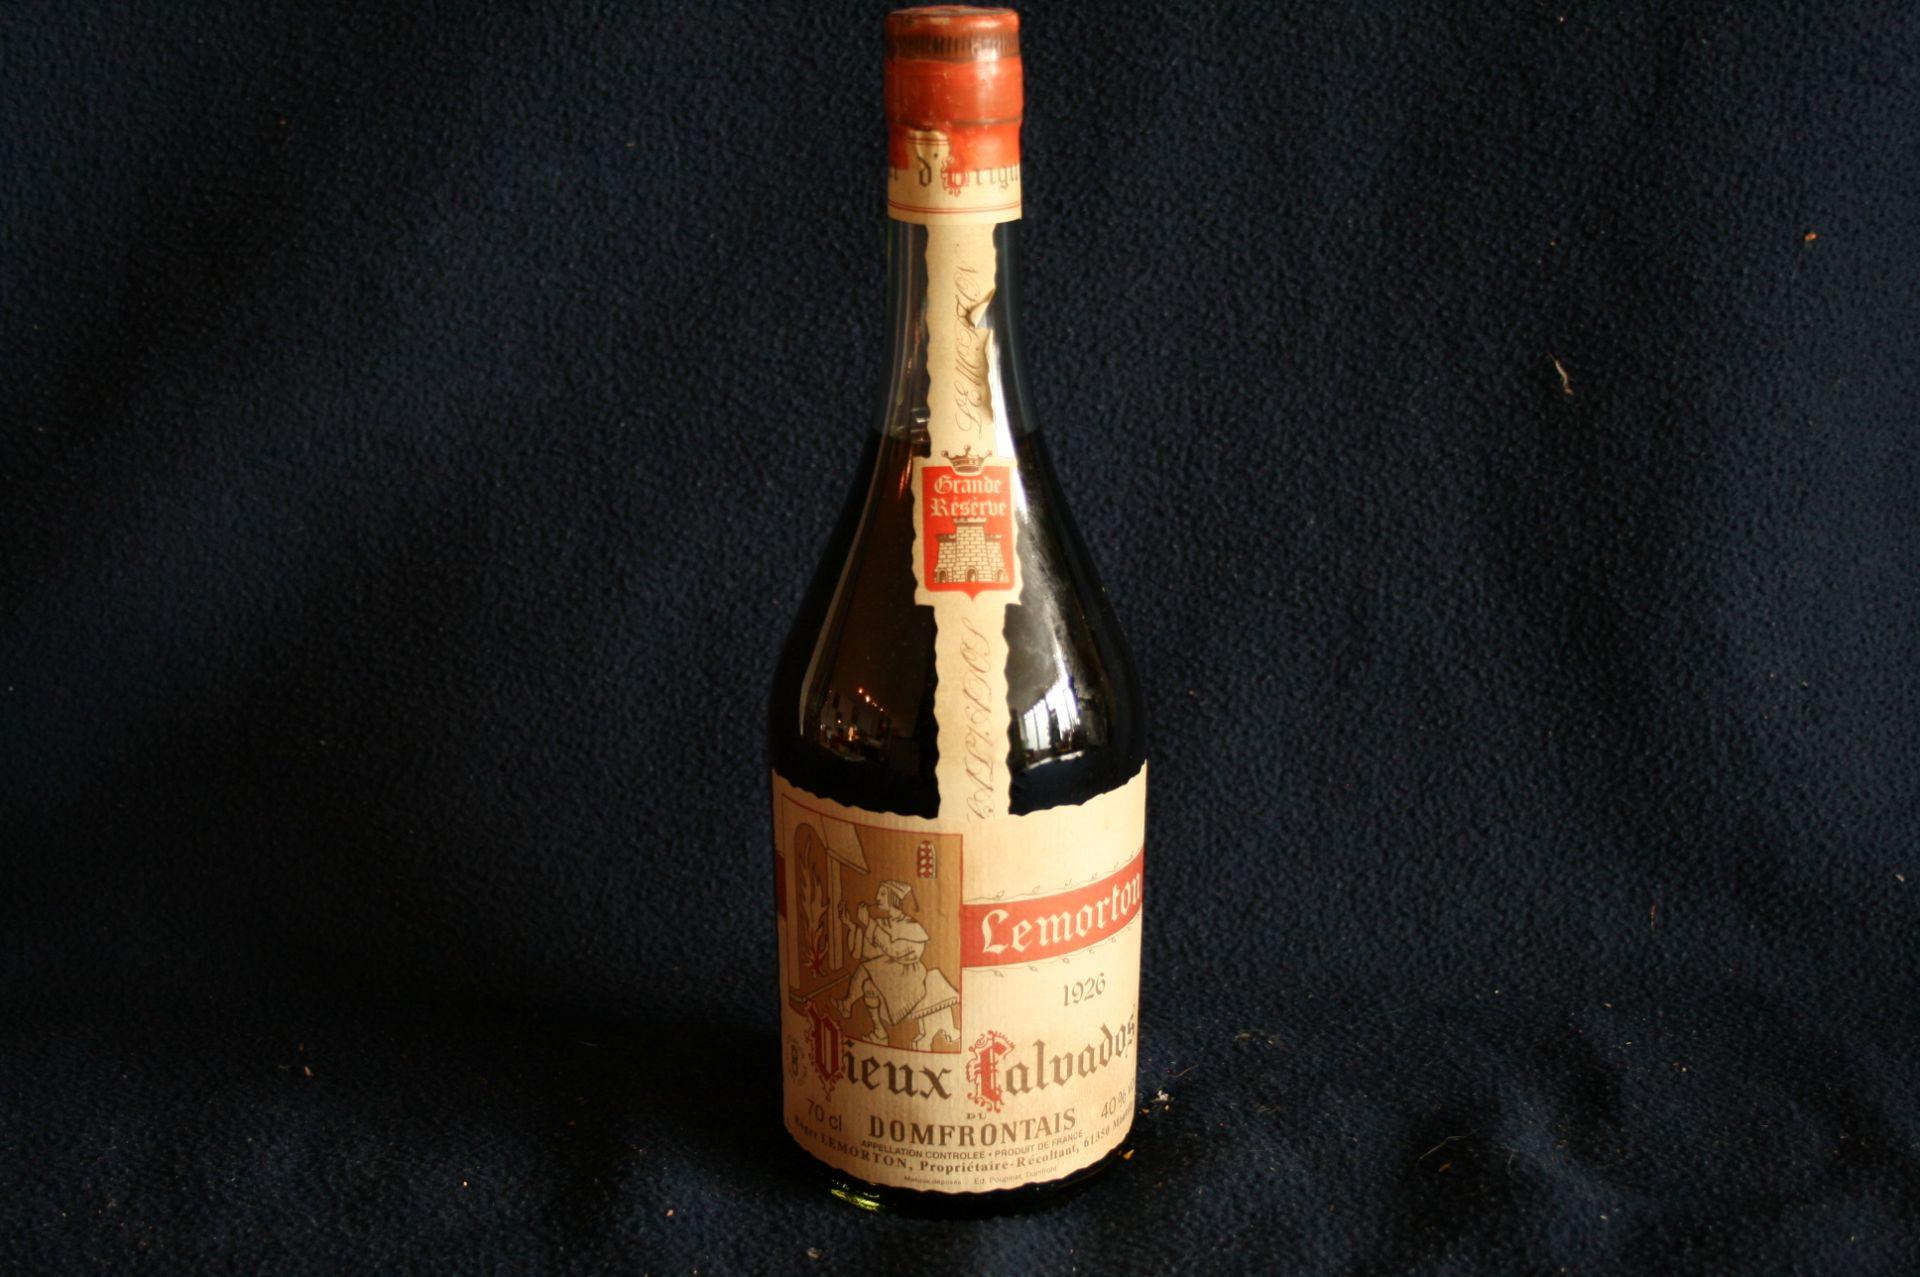 Los 21 - LEMORTON Vieux Calvados du Domfrontais, année 1926, Grande Reserve, 0,7 litre, Alc. [...]